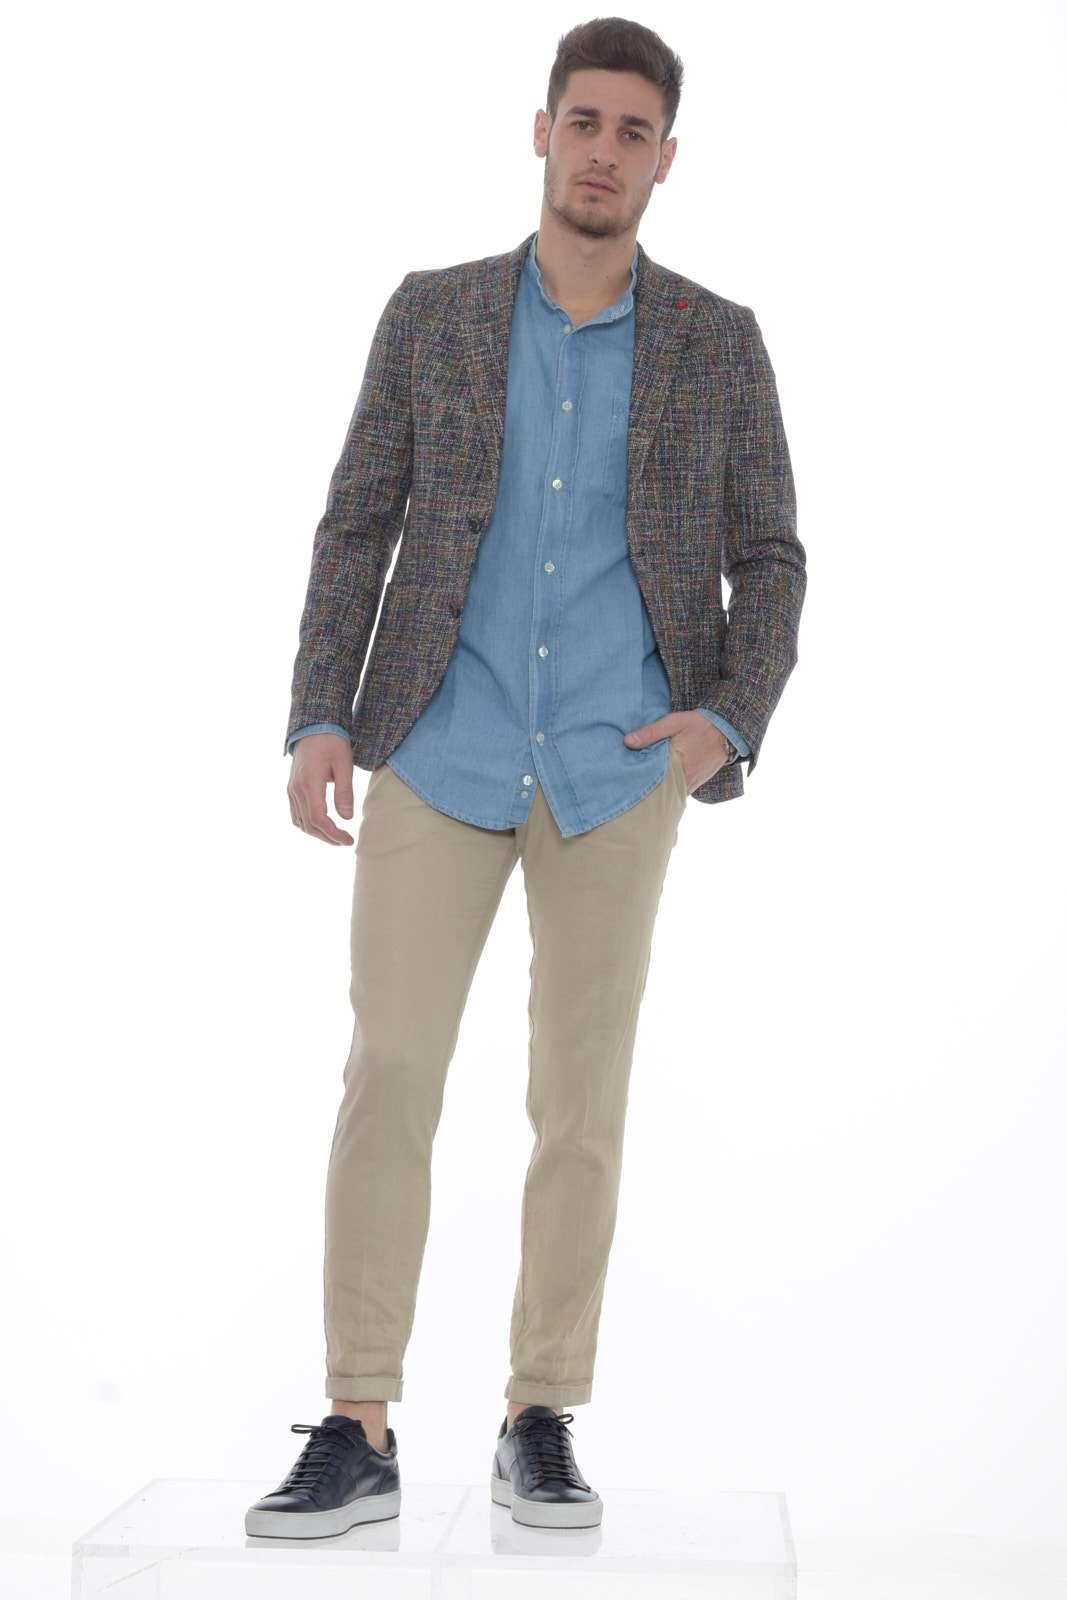 https://www.parmax.com/media/catalog/product/a/i/PE-outlet_parmax-giacca-uomo-Manuel-Ritz-2632G2038%20193165-D.jpg